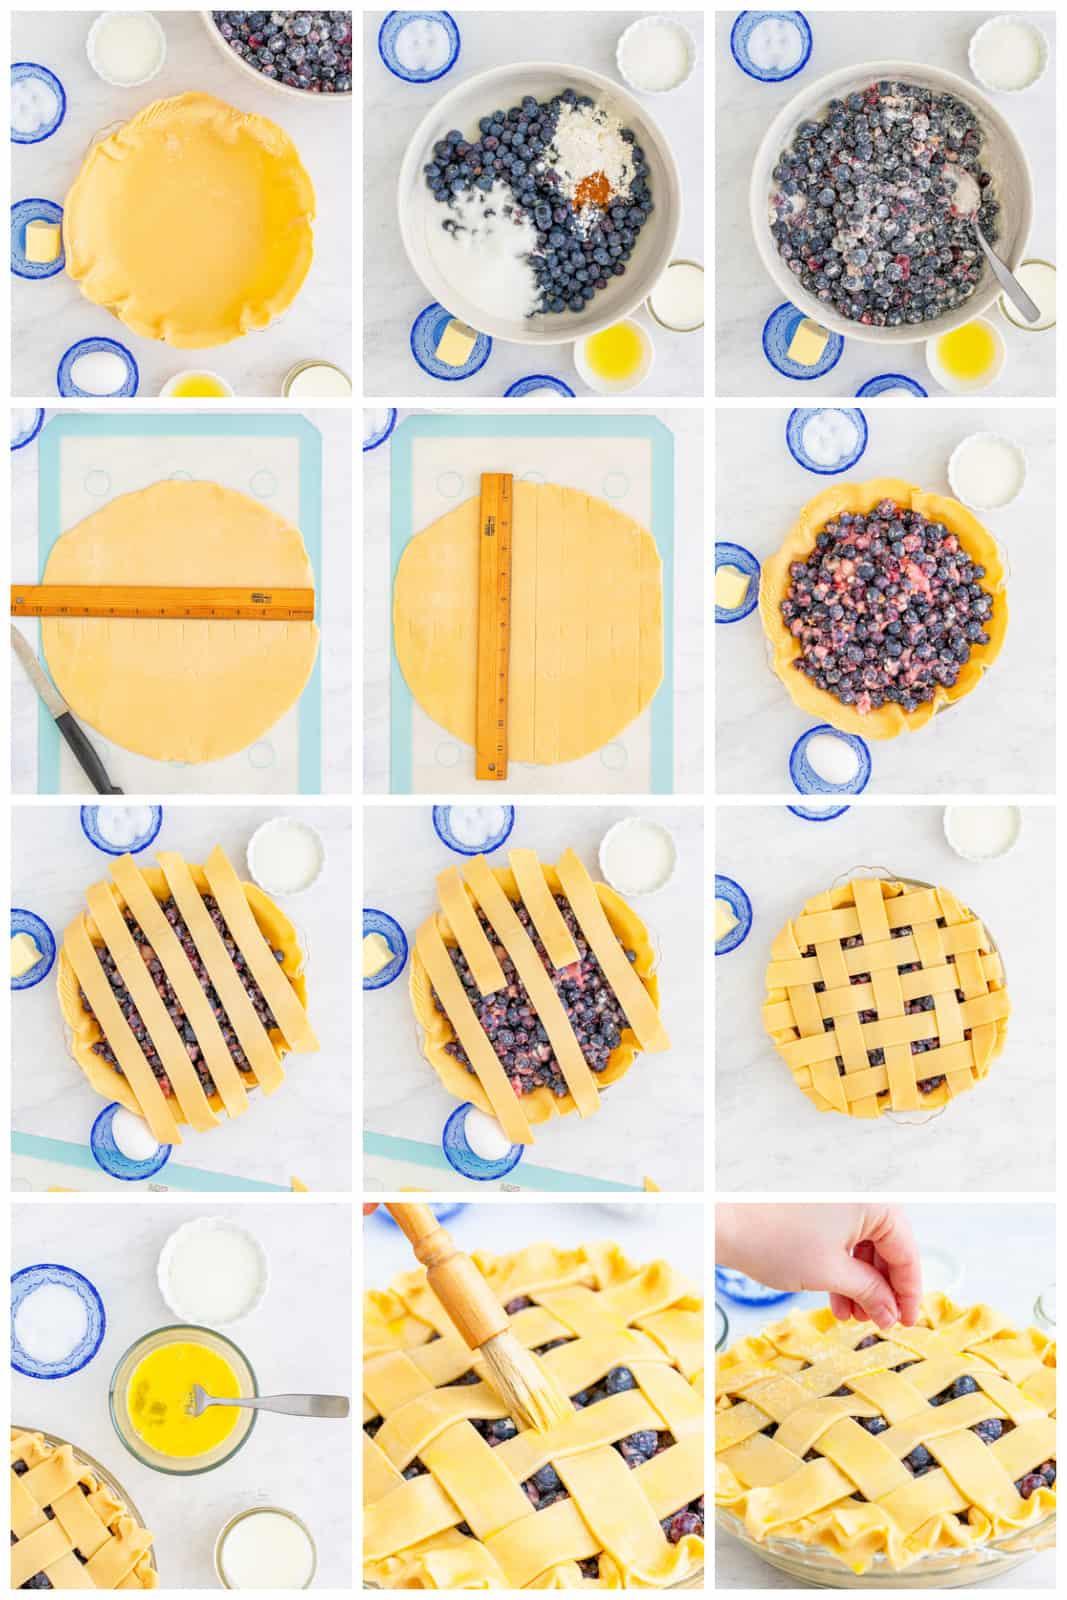 Step photos on how to make a Blueberry Pie Recipe